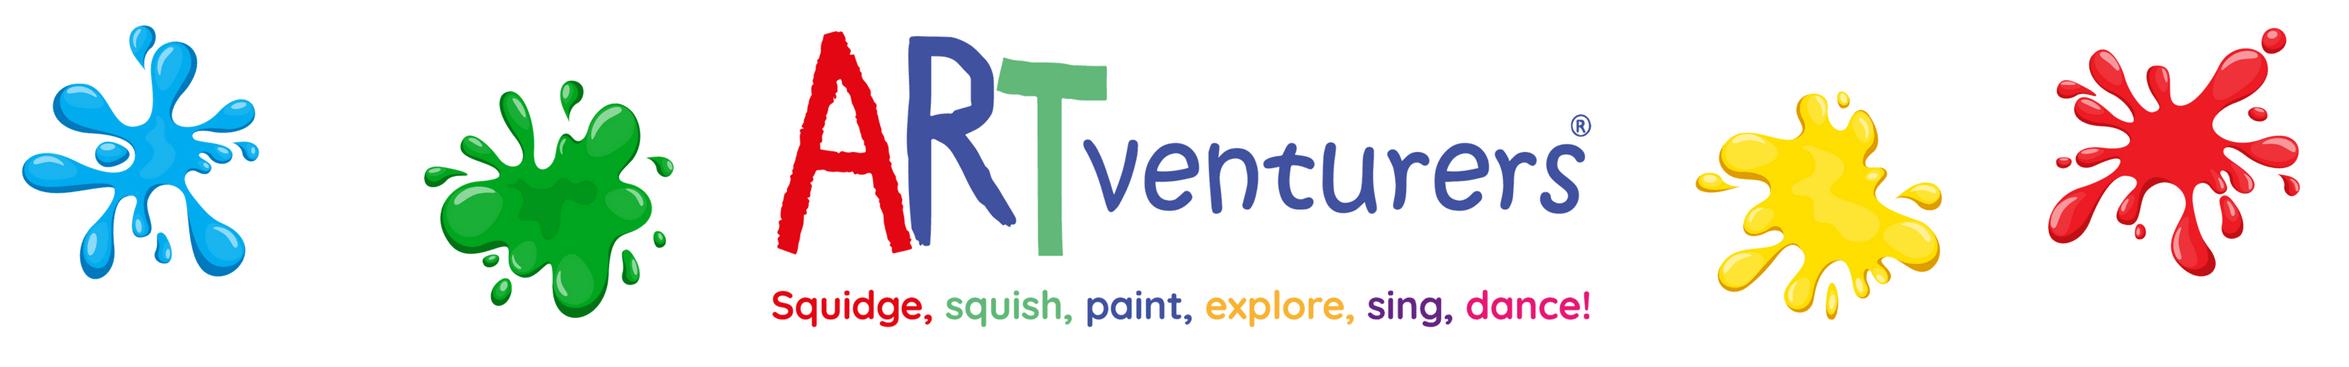 ARTventurers Selby, Tadcaster & Goole